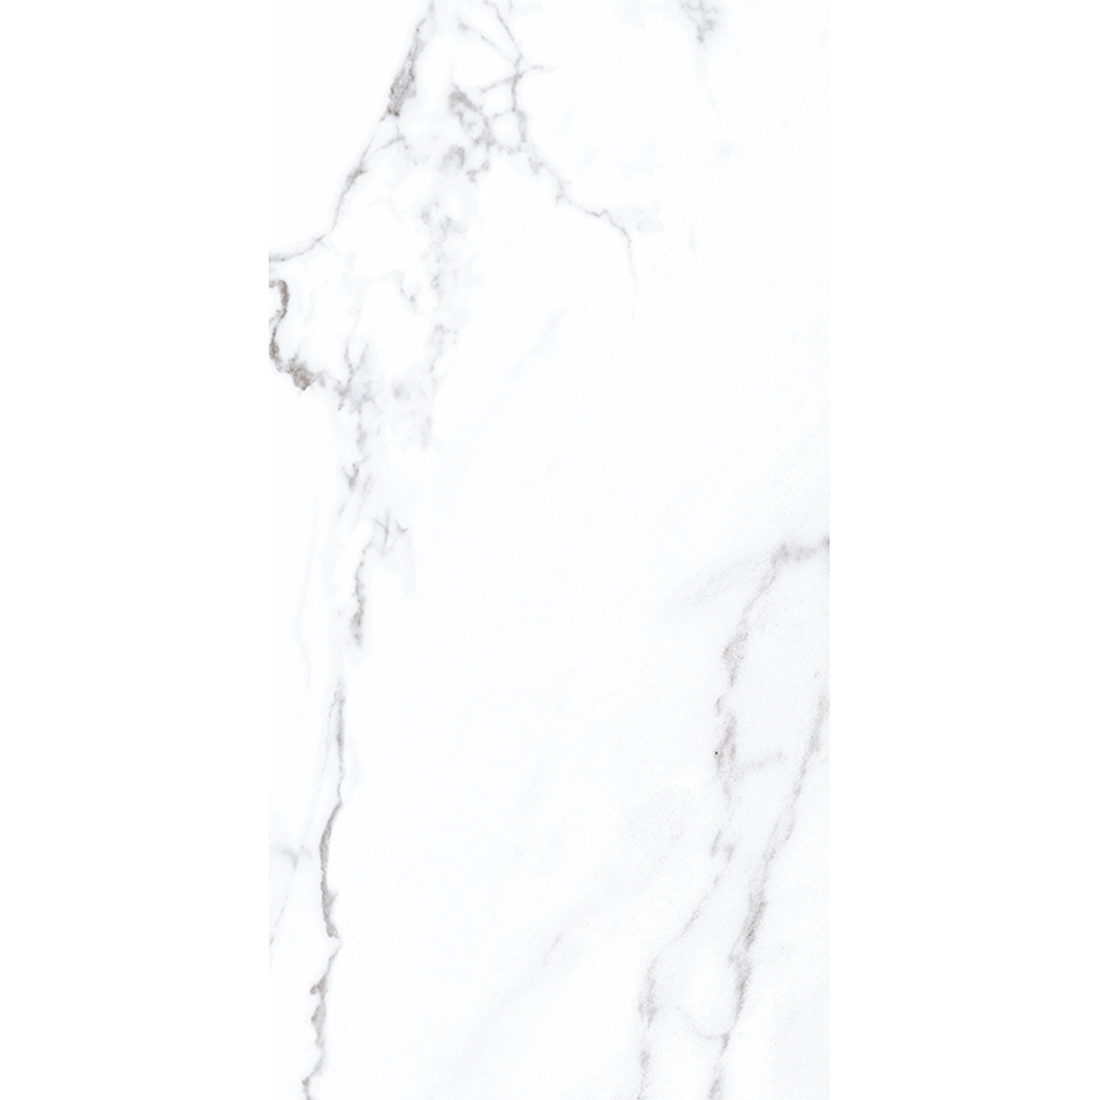 Nitco Aeon Calacatta N5004-IG Glossy Glazed Vitrified Tile